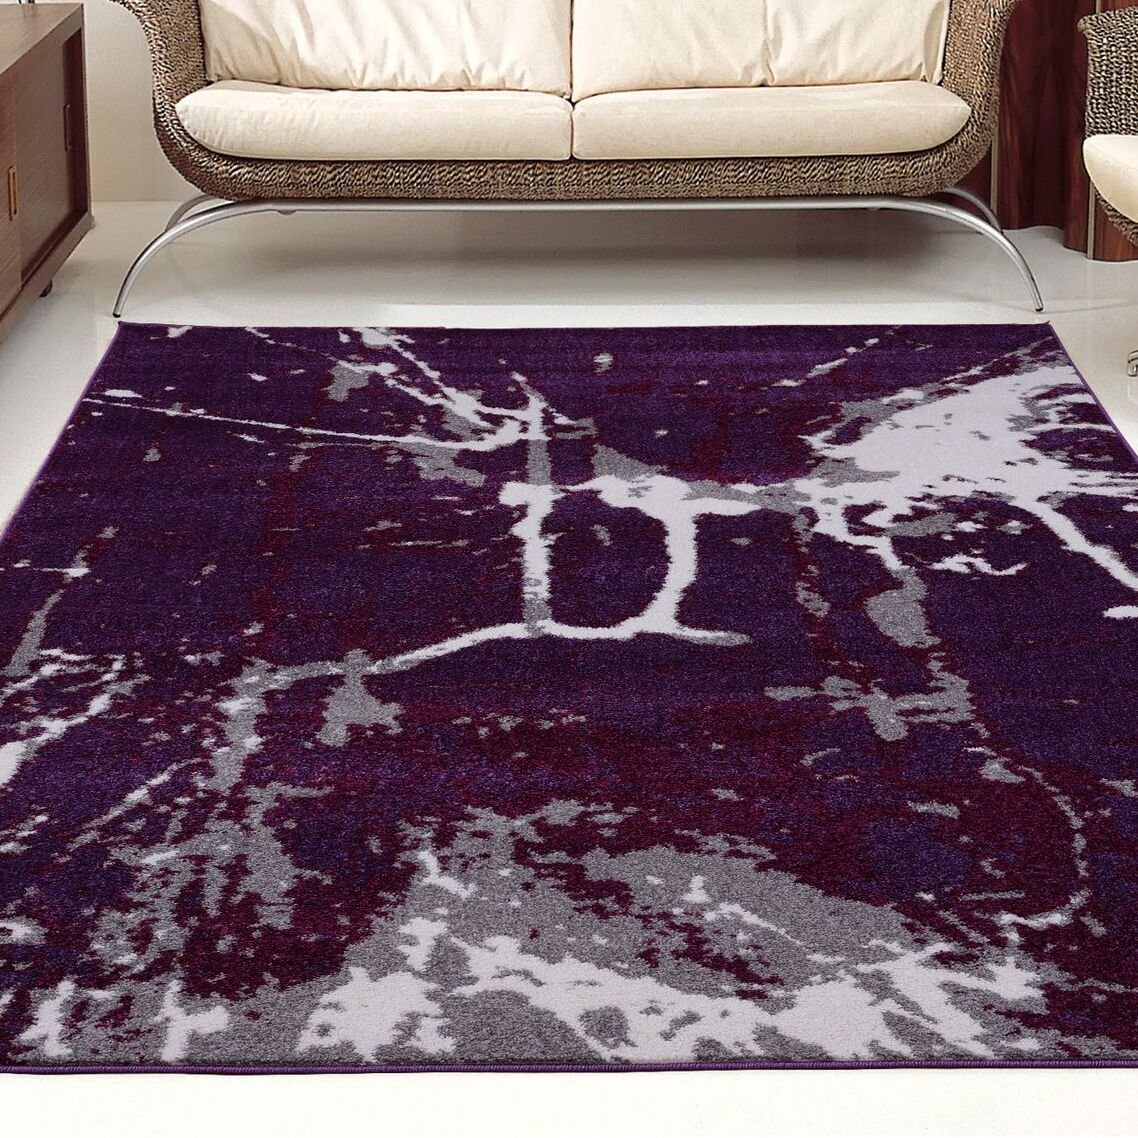 Anise Dark Violet/Gray Area Rug Rug Size: 6'5